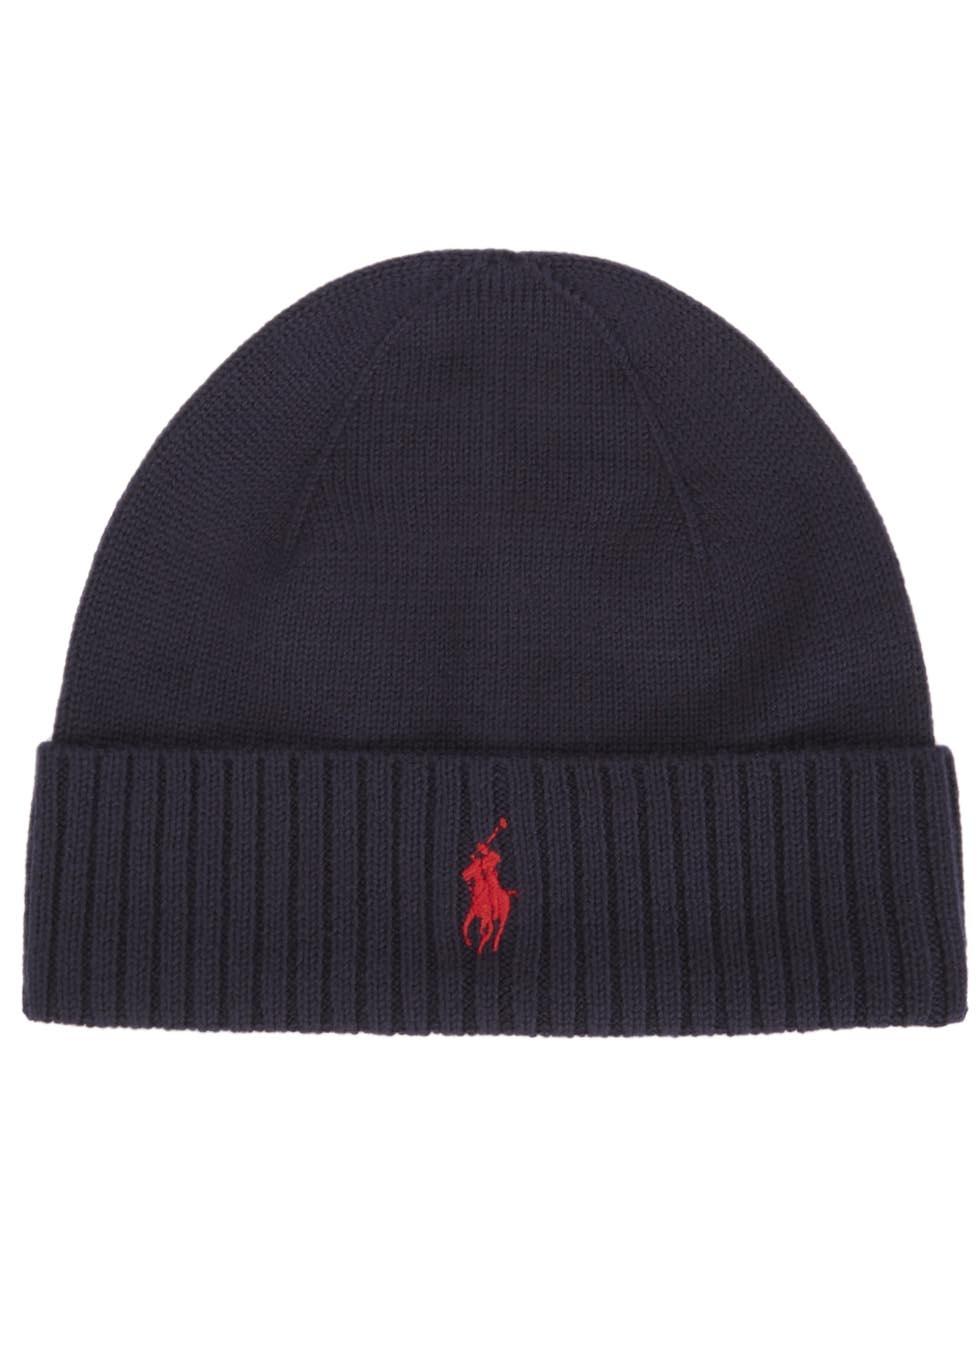 be9291465 Wonderful Lyst - Polo Ralph Lauren Navy Merino Wool Hat in Blue for Men IY91